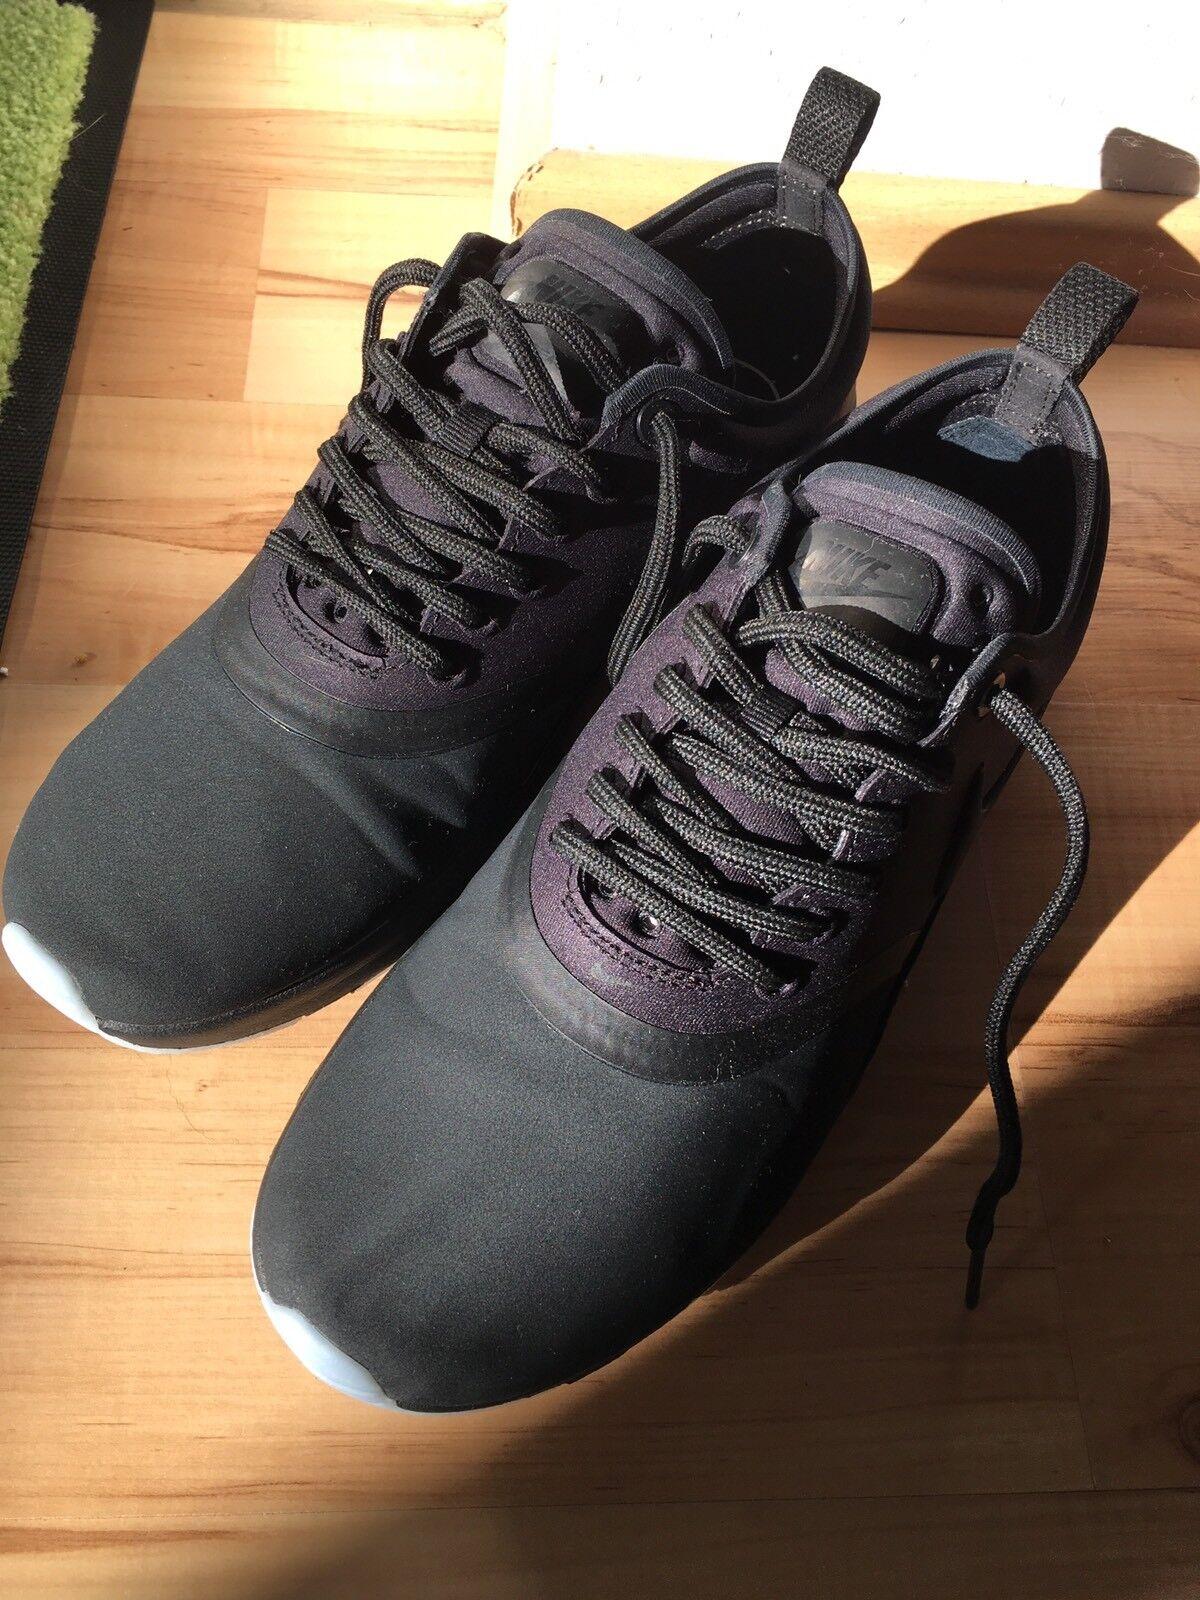 online retailer 77e49 6083c Nike Air Zoom Elite 9 9 9 Men s Running Shoes 863769-404 Blustery Black Wht  Sz 11.5 923fa3